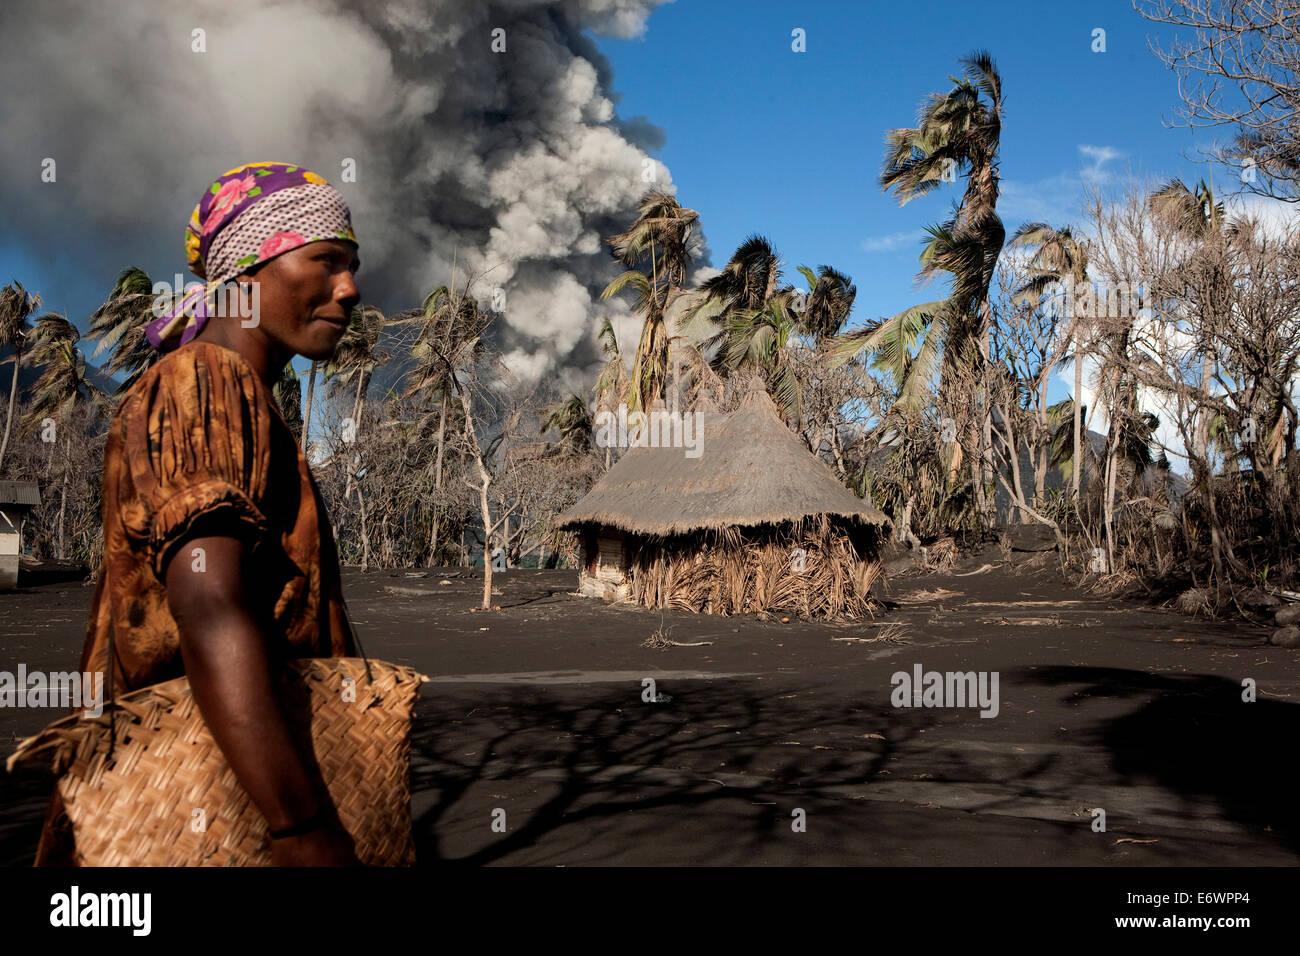 Alltag auf Matupit Insel, Vulkan Tavurvur, Rabaul, East New Britain, Papua-Neu-Guinea, Melanesien - Pazifik Stockbild